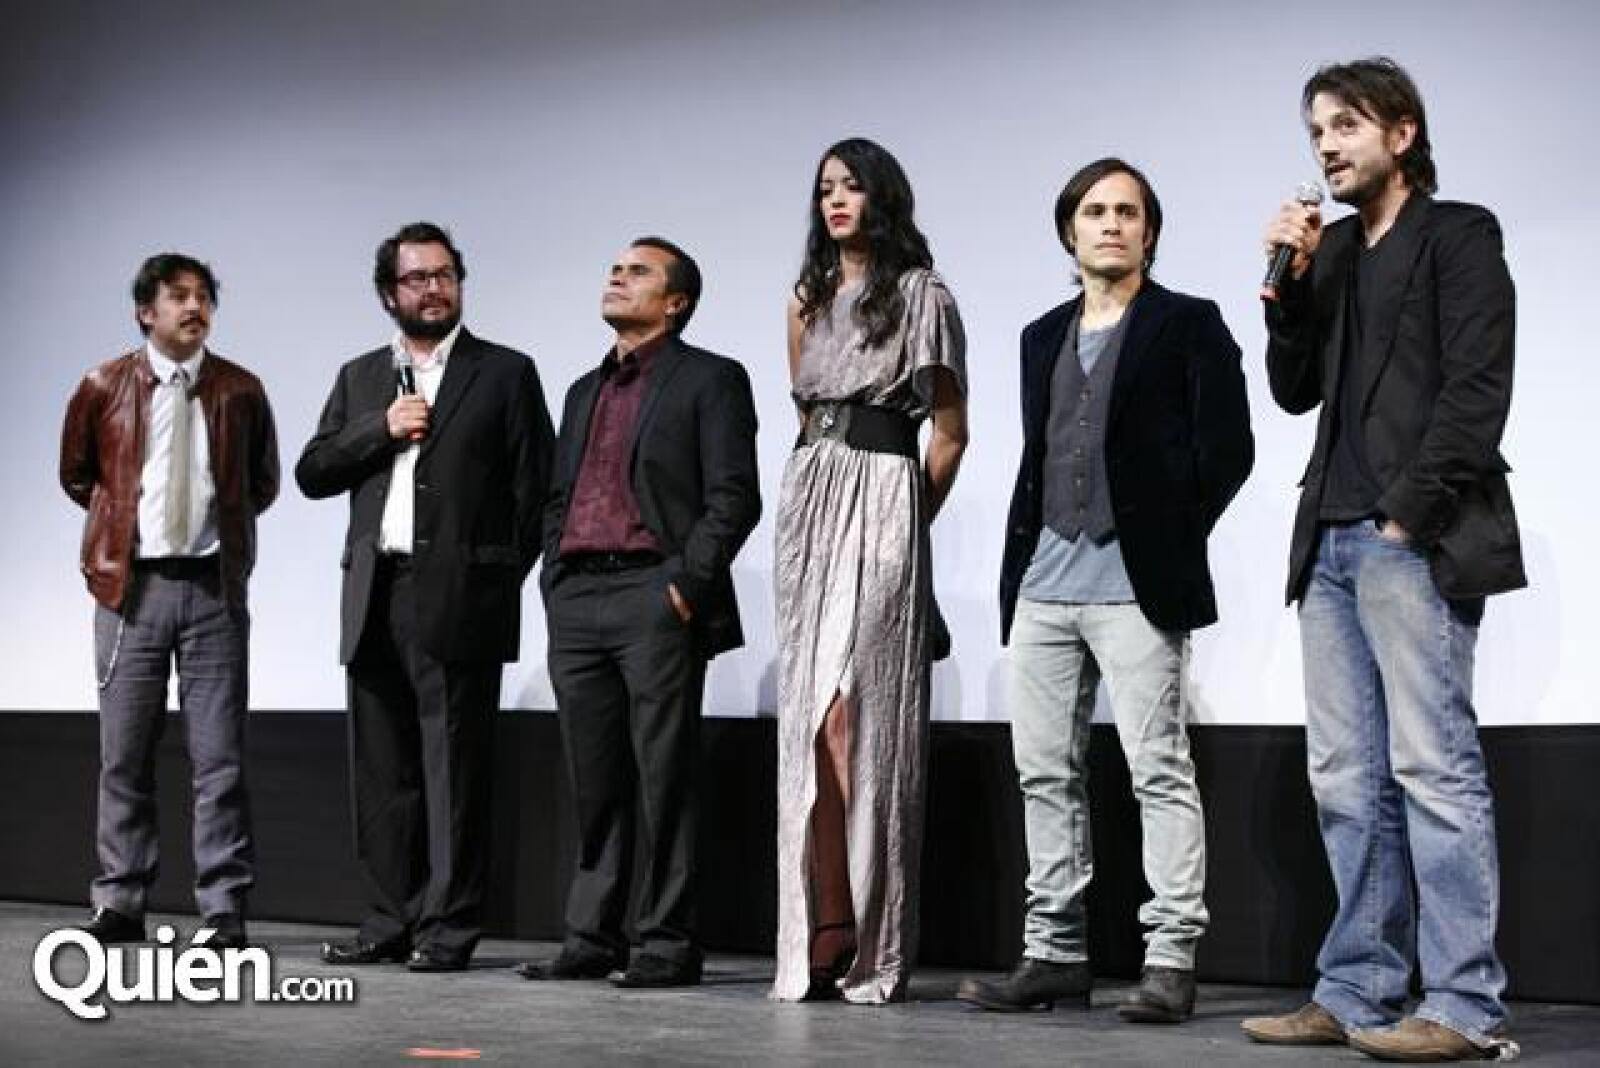 Gerardo Naranjo,Pablo Cruz,Noé Hernández,Stephanie Sigman,Gael García Bernal,Diego Luna